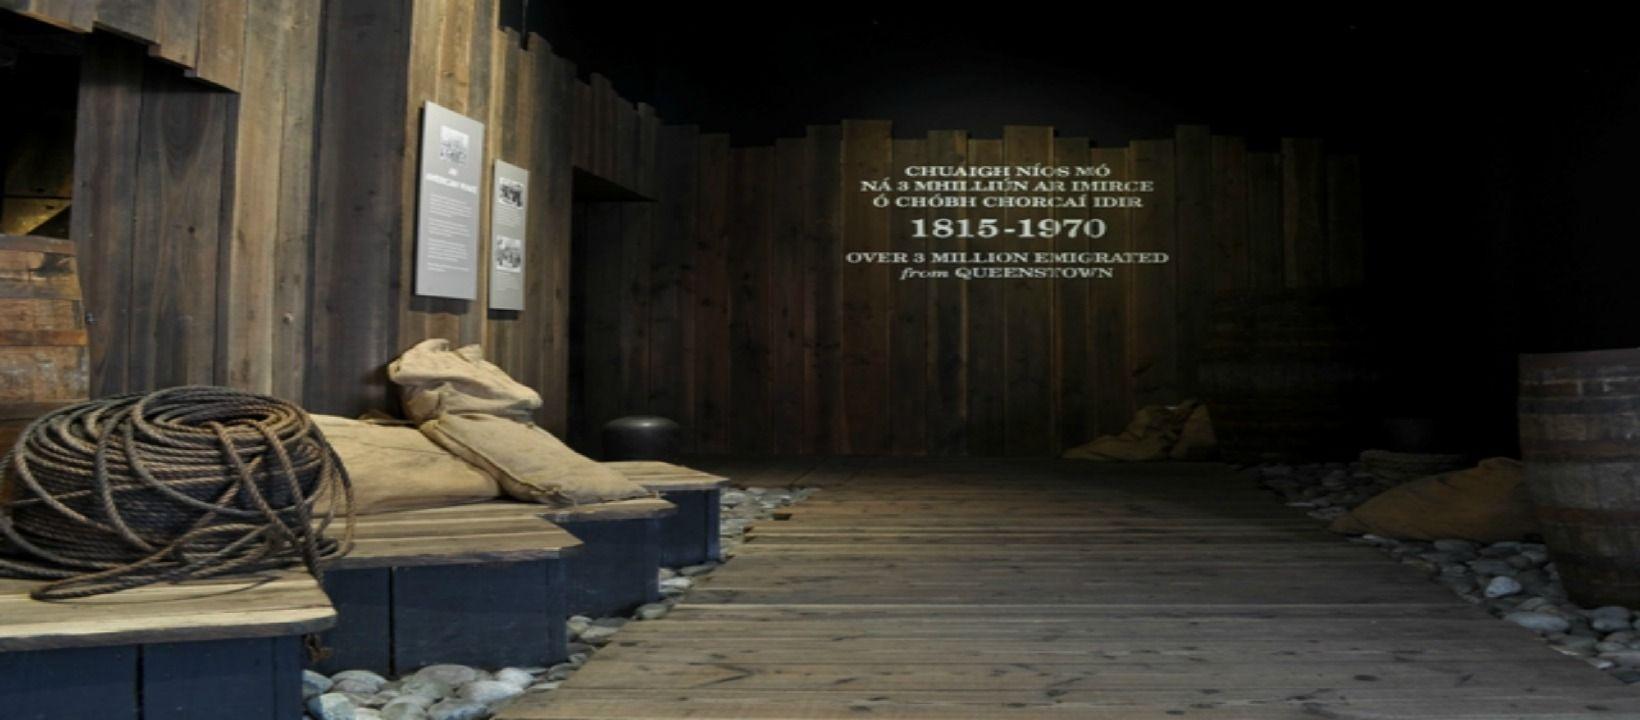 Cobh Heritage Center | History of Cobh | Commodore Hotel